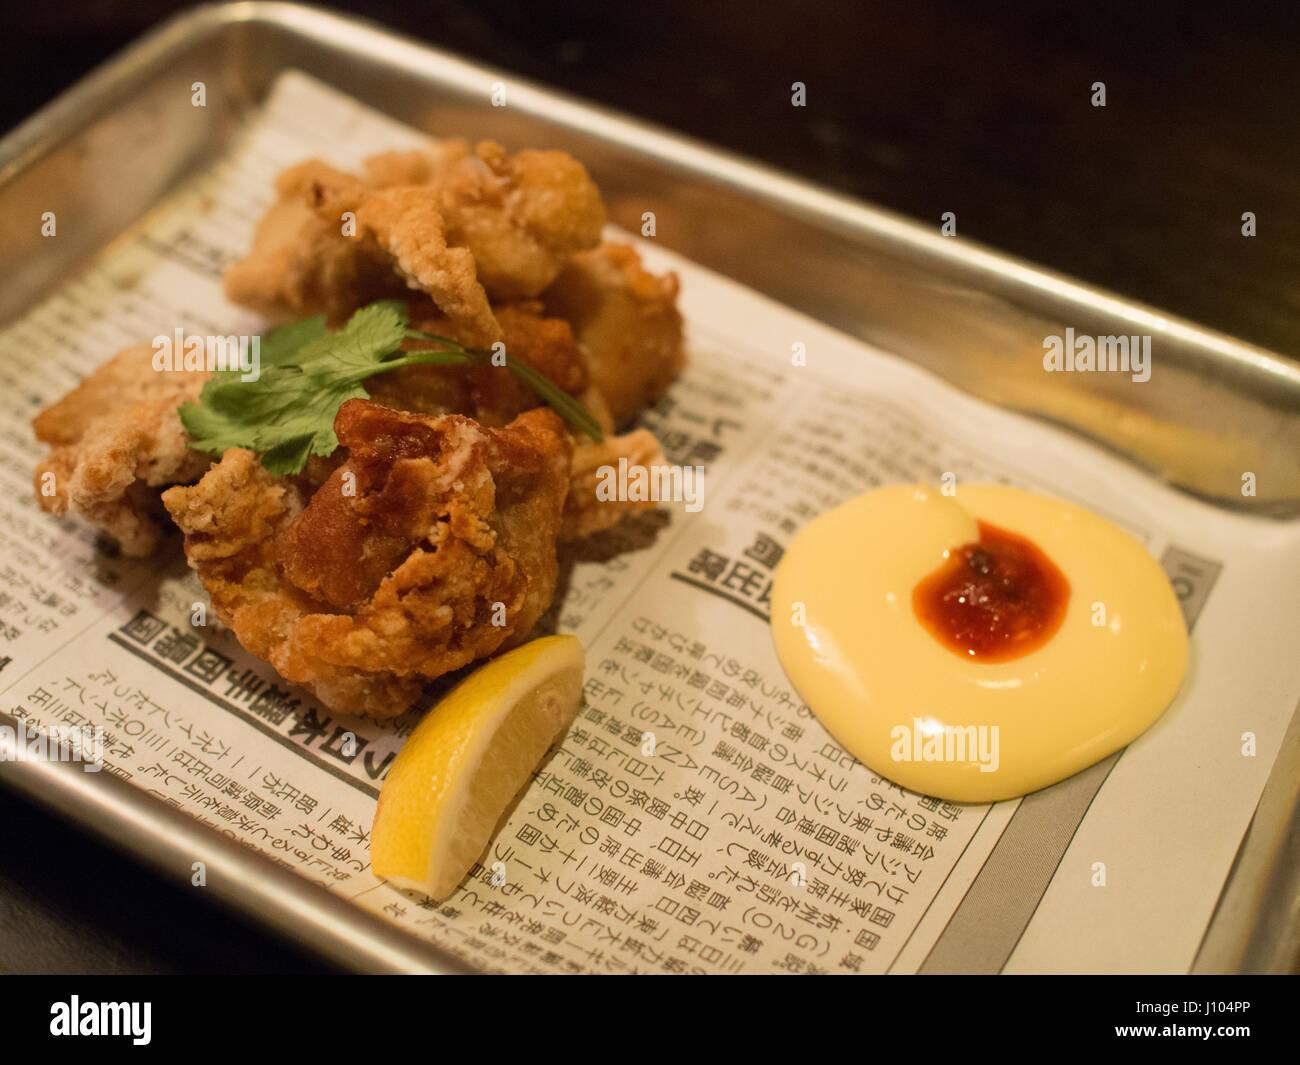 Chicken kaarage at Kemuri Tatsu-ya, a Japanese izakaya in Austin, Texas - Stock Image